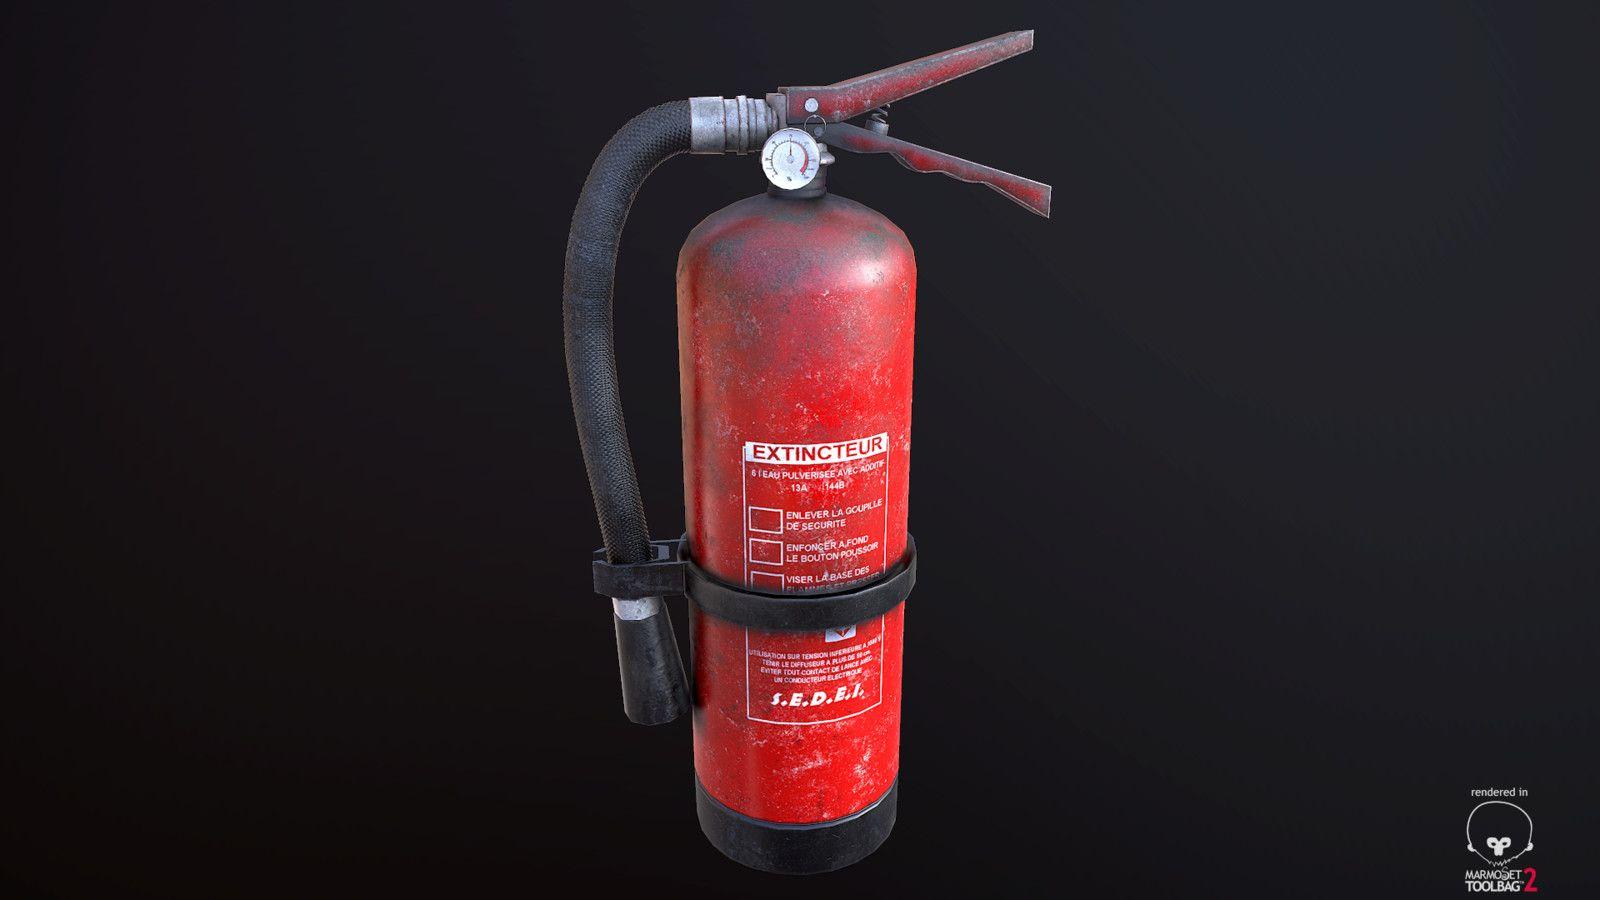 Extinguisher, Yohan Talbi on ArtStation at https://www.artstation.com/artwork/kz45y